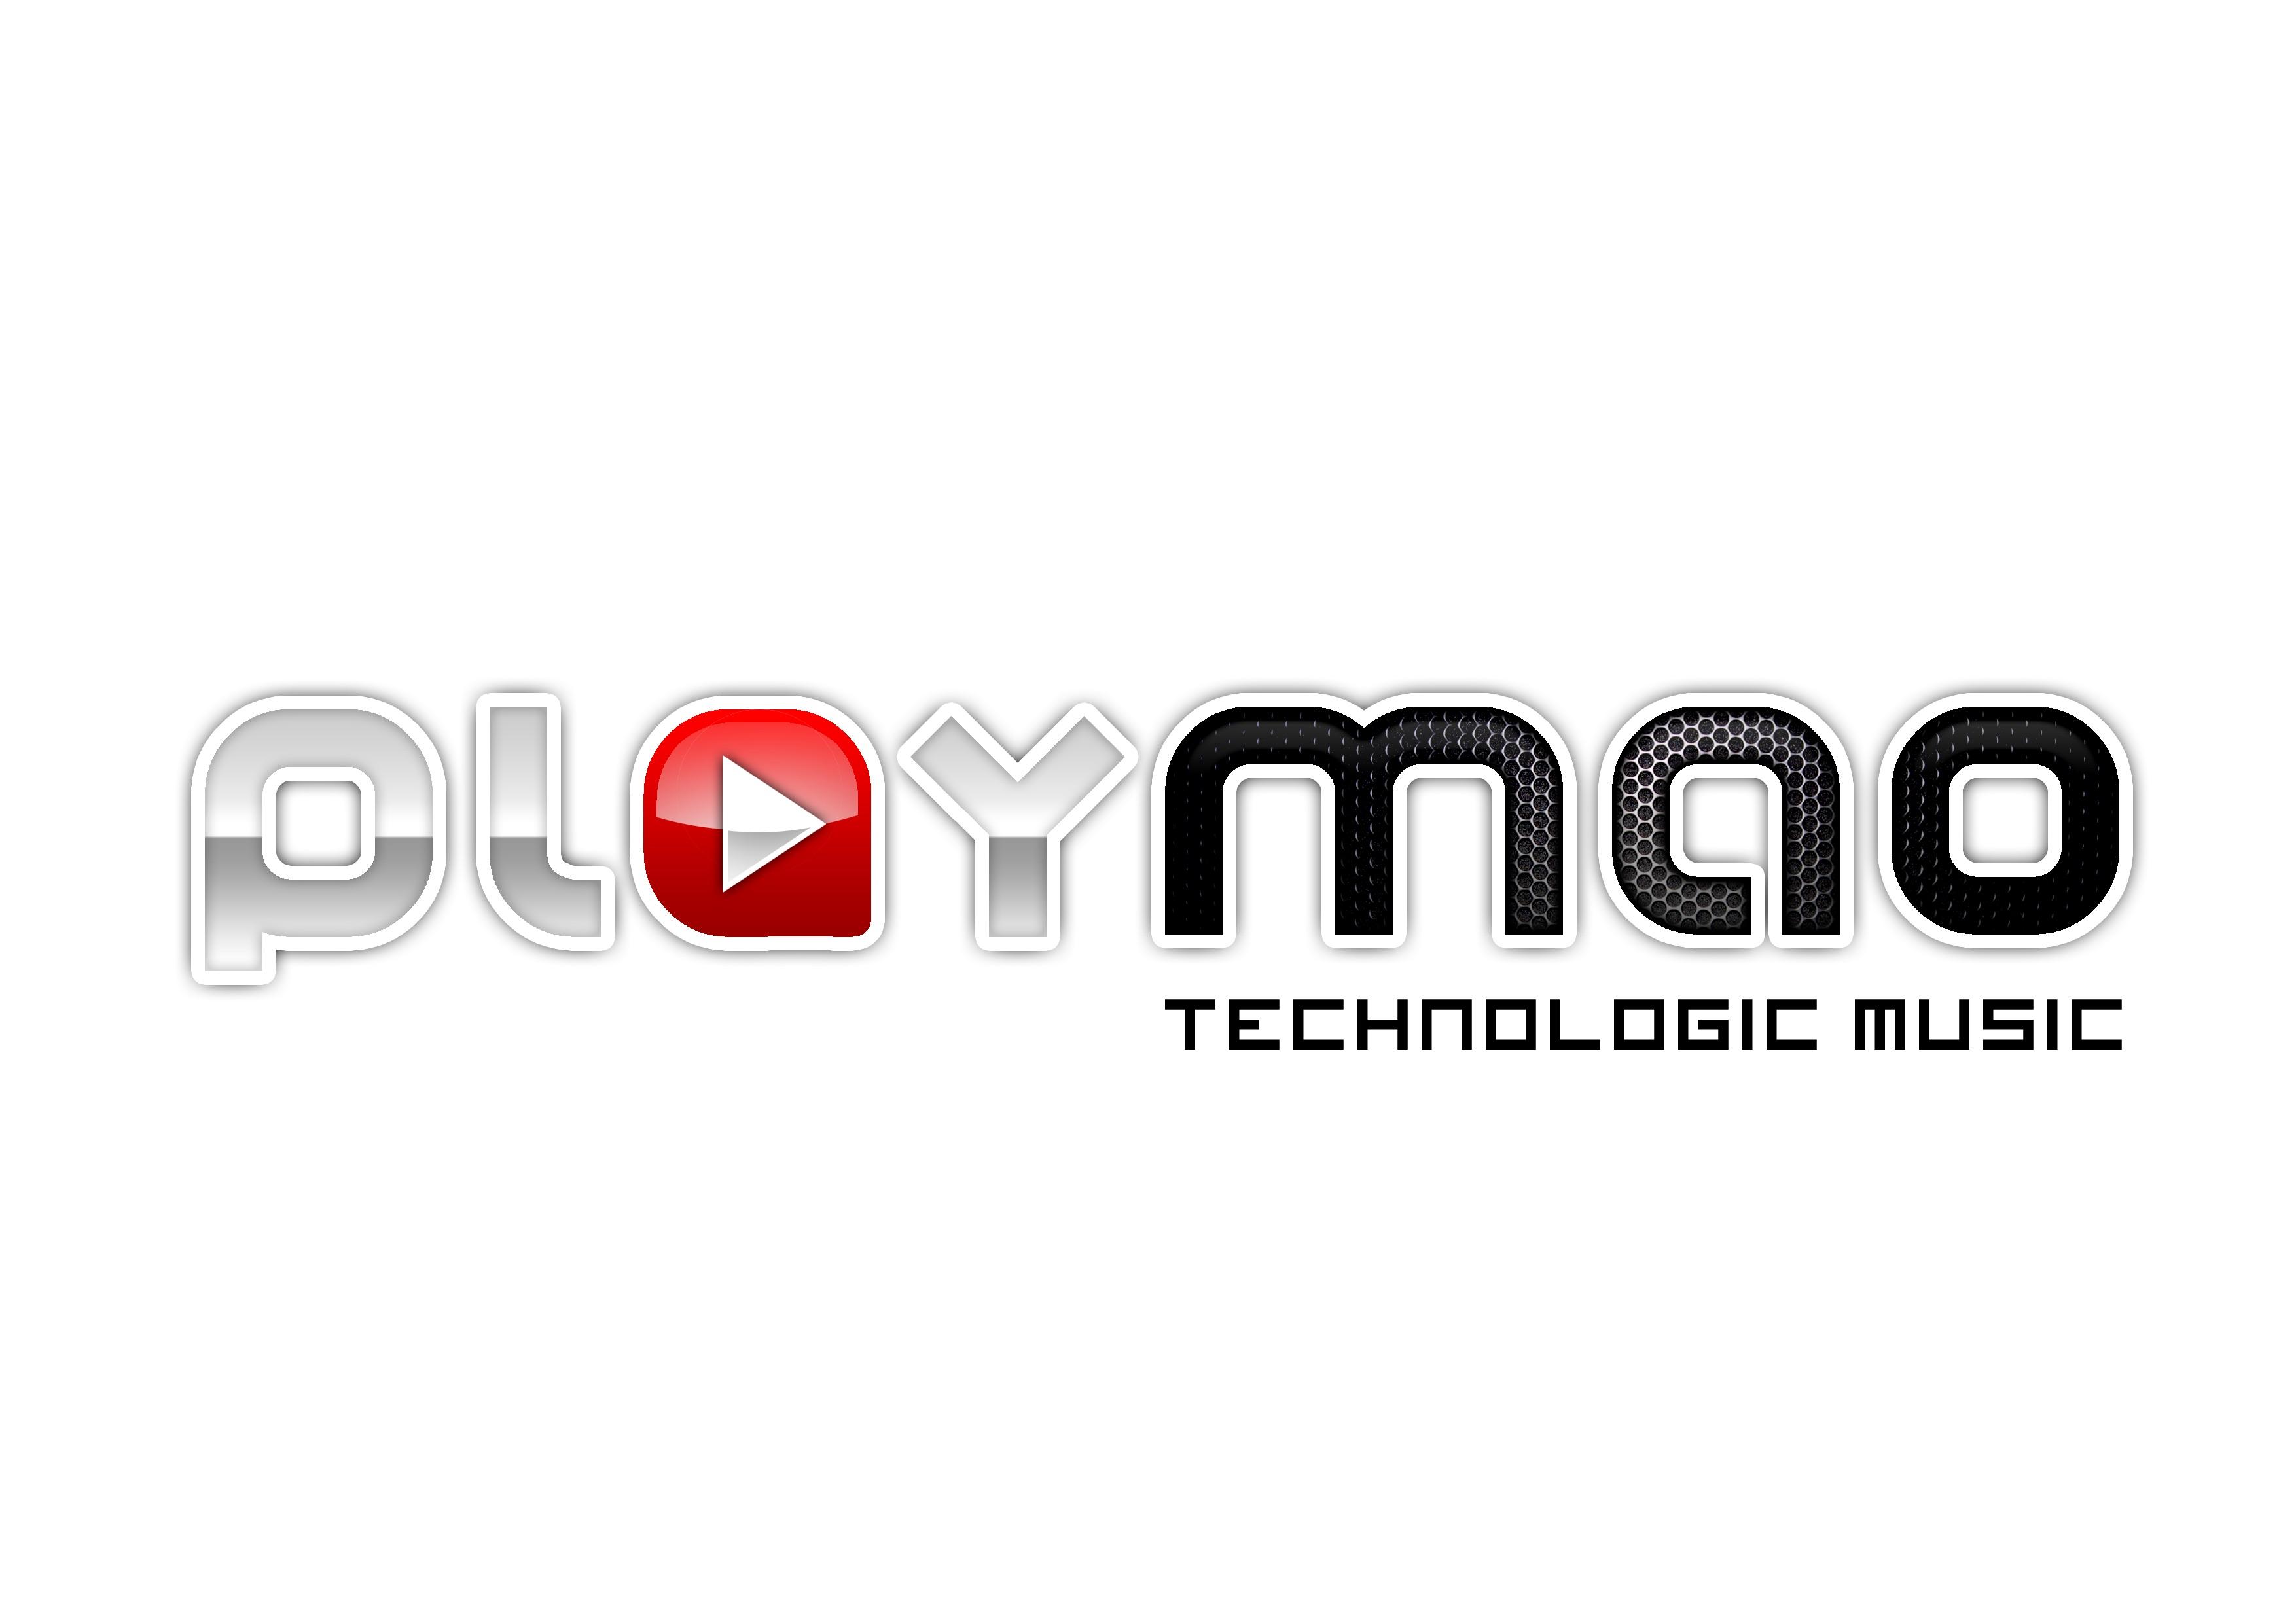 technologicmusicplaymao